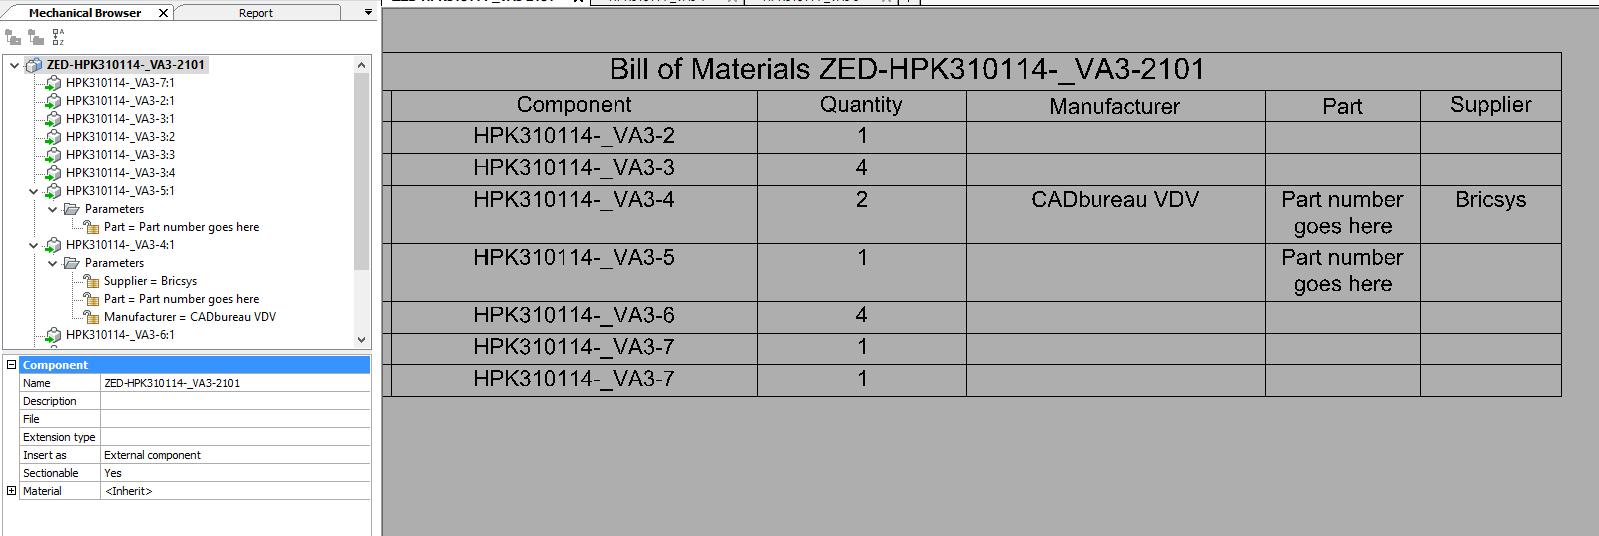 Bill of Materials - BricsCAD Forum